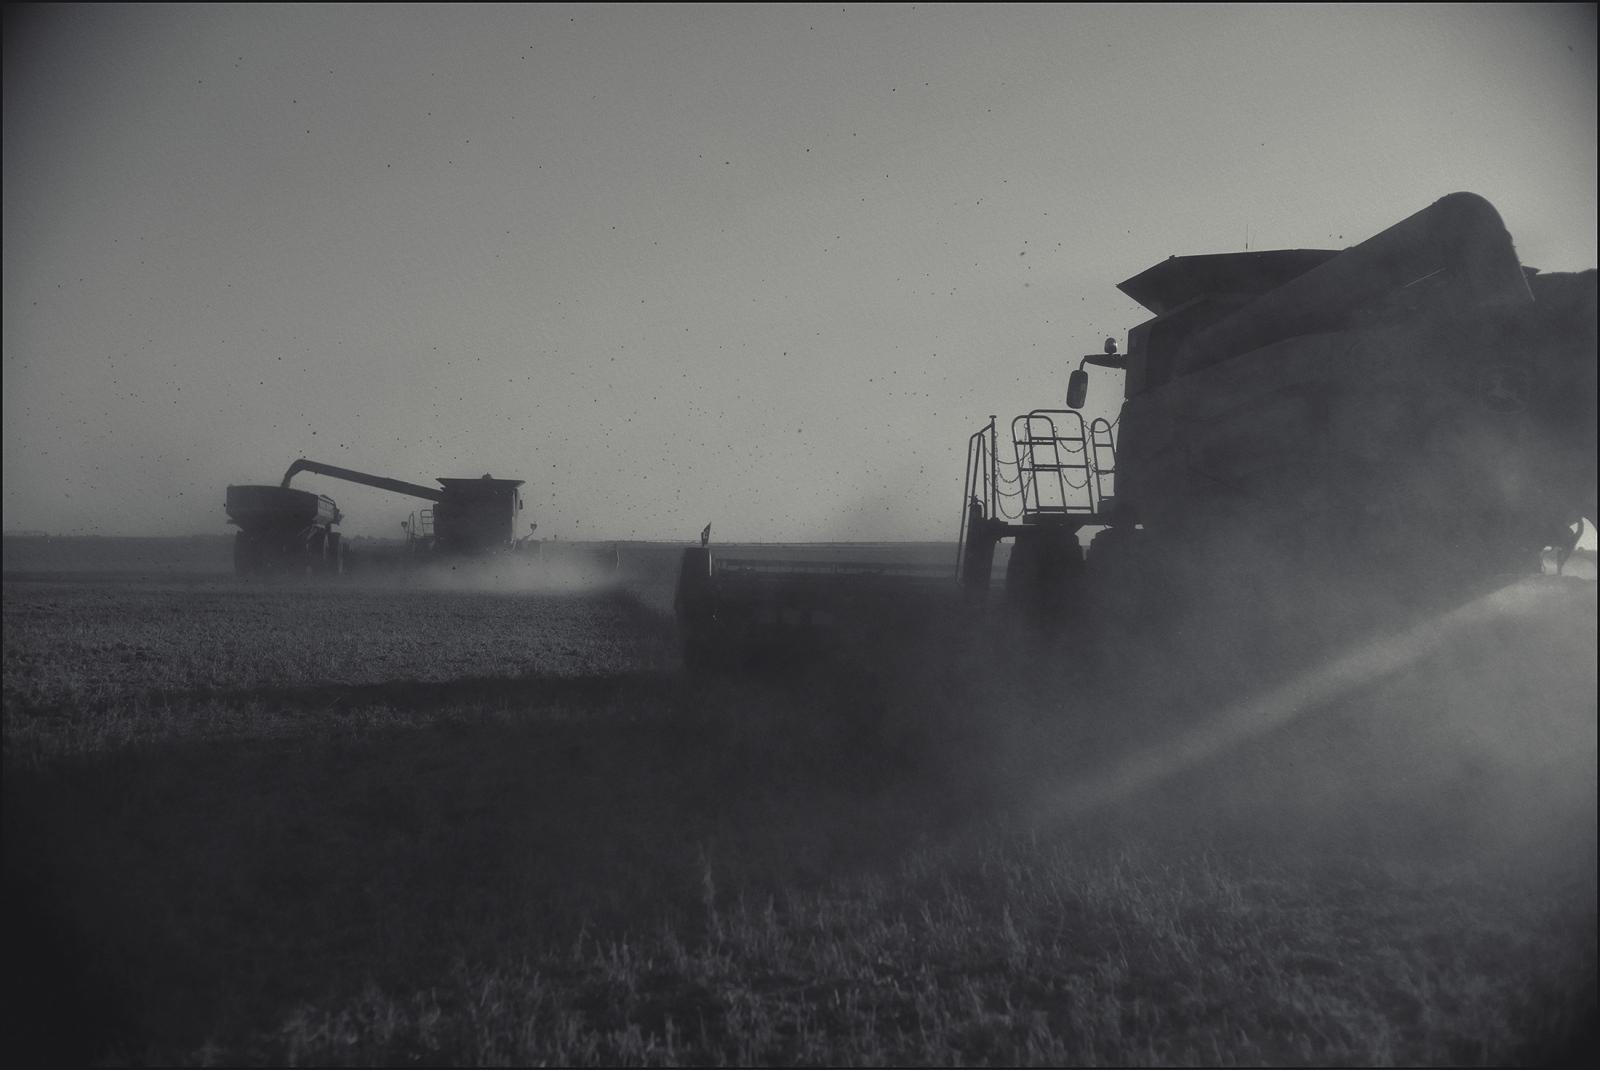 Harvest.Liberal, KS. 2015.